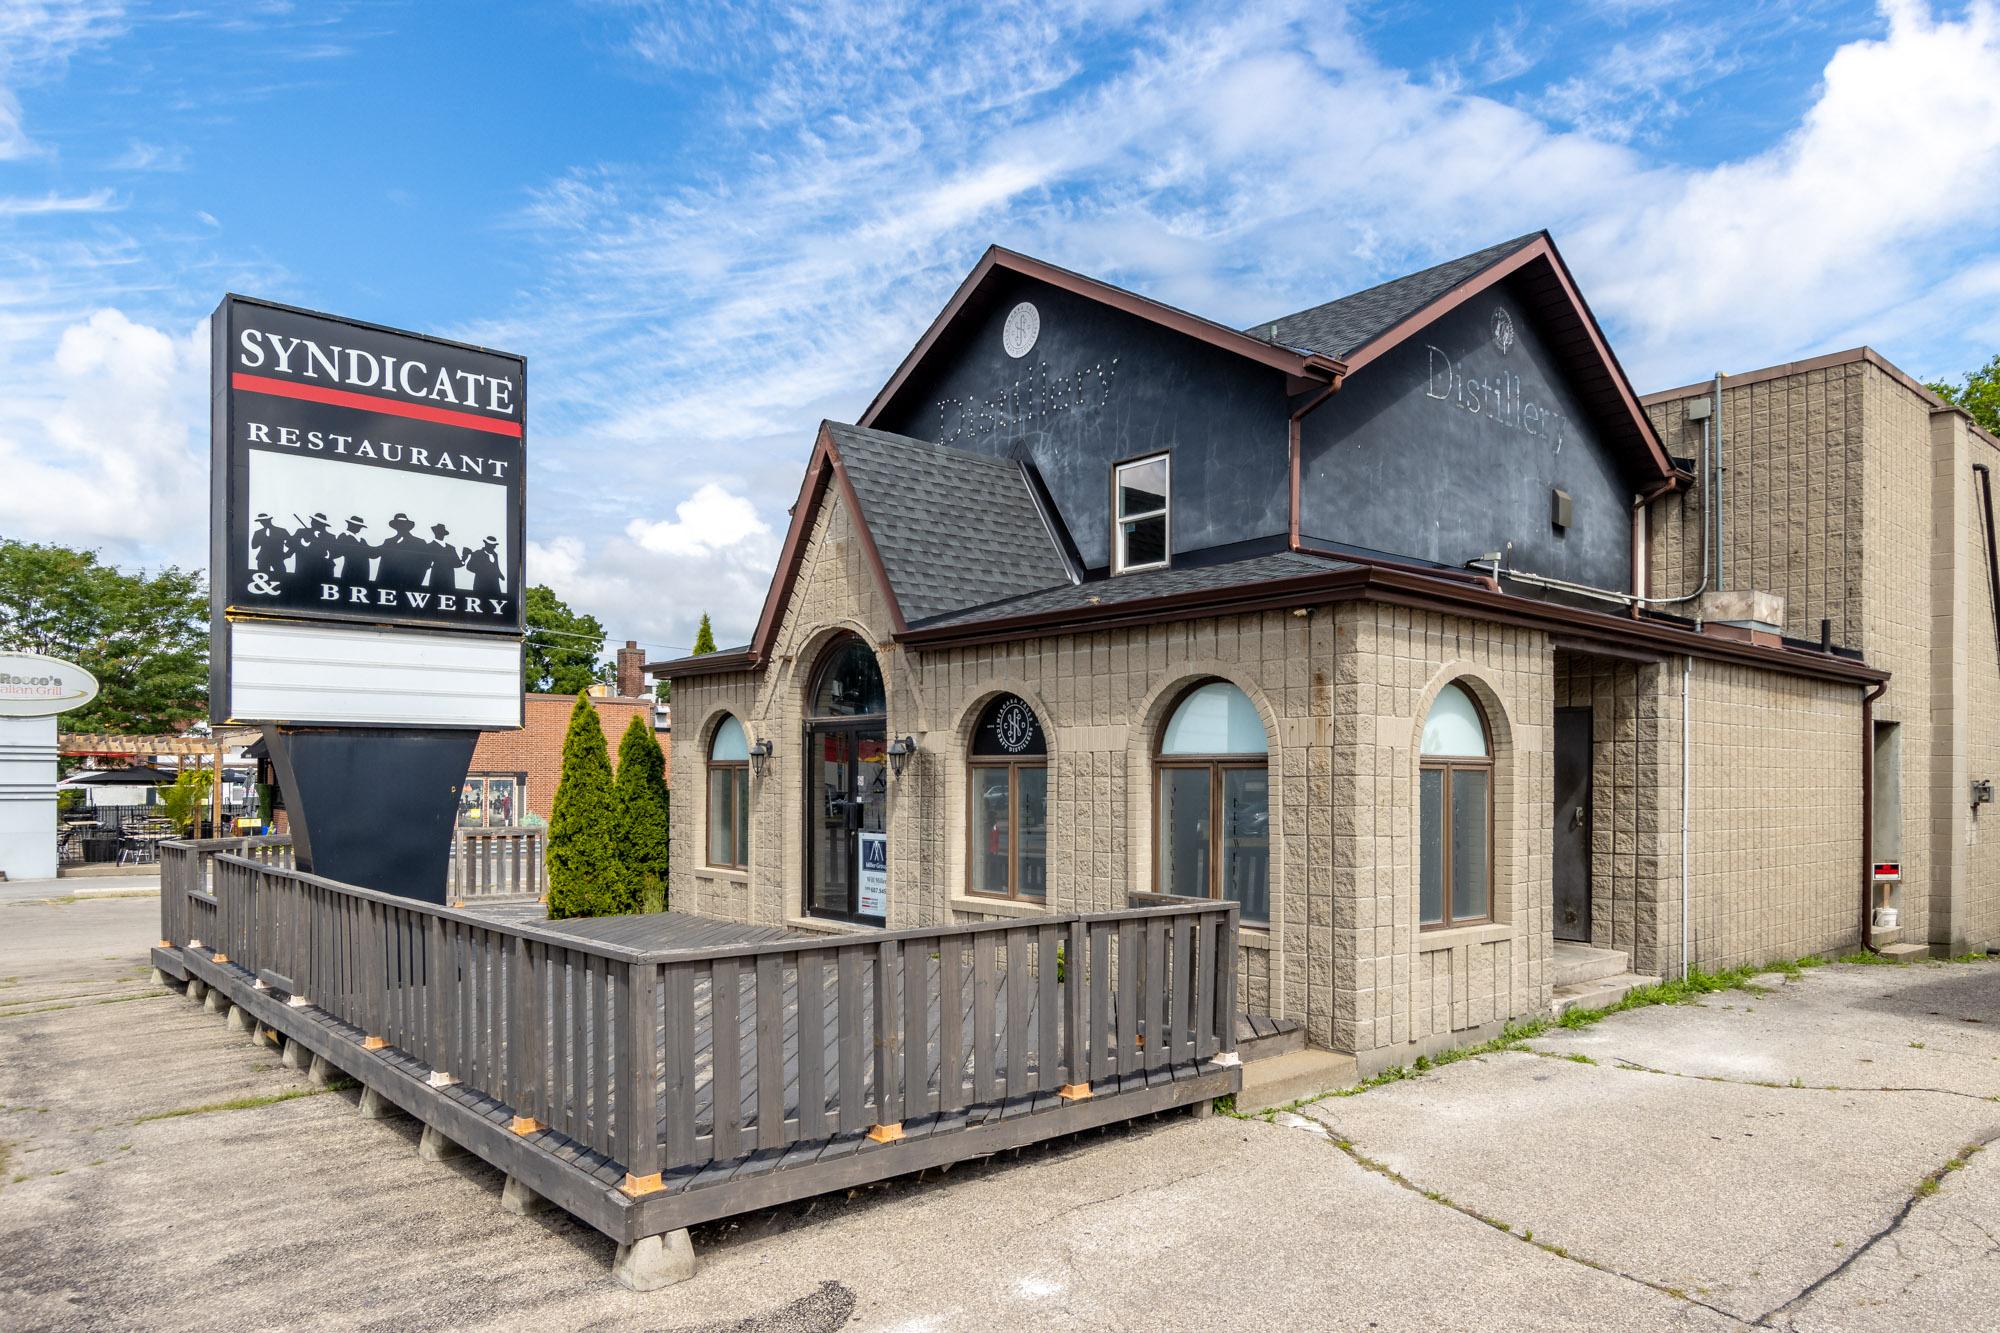 Property image for 6871 Lundy's Lane, Niagara Falls